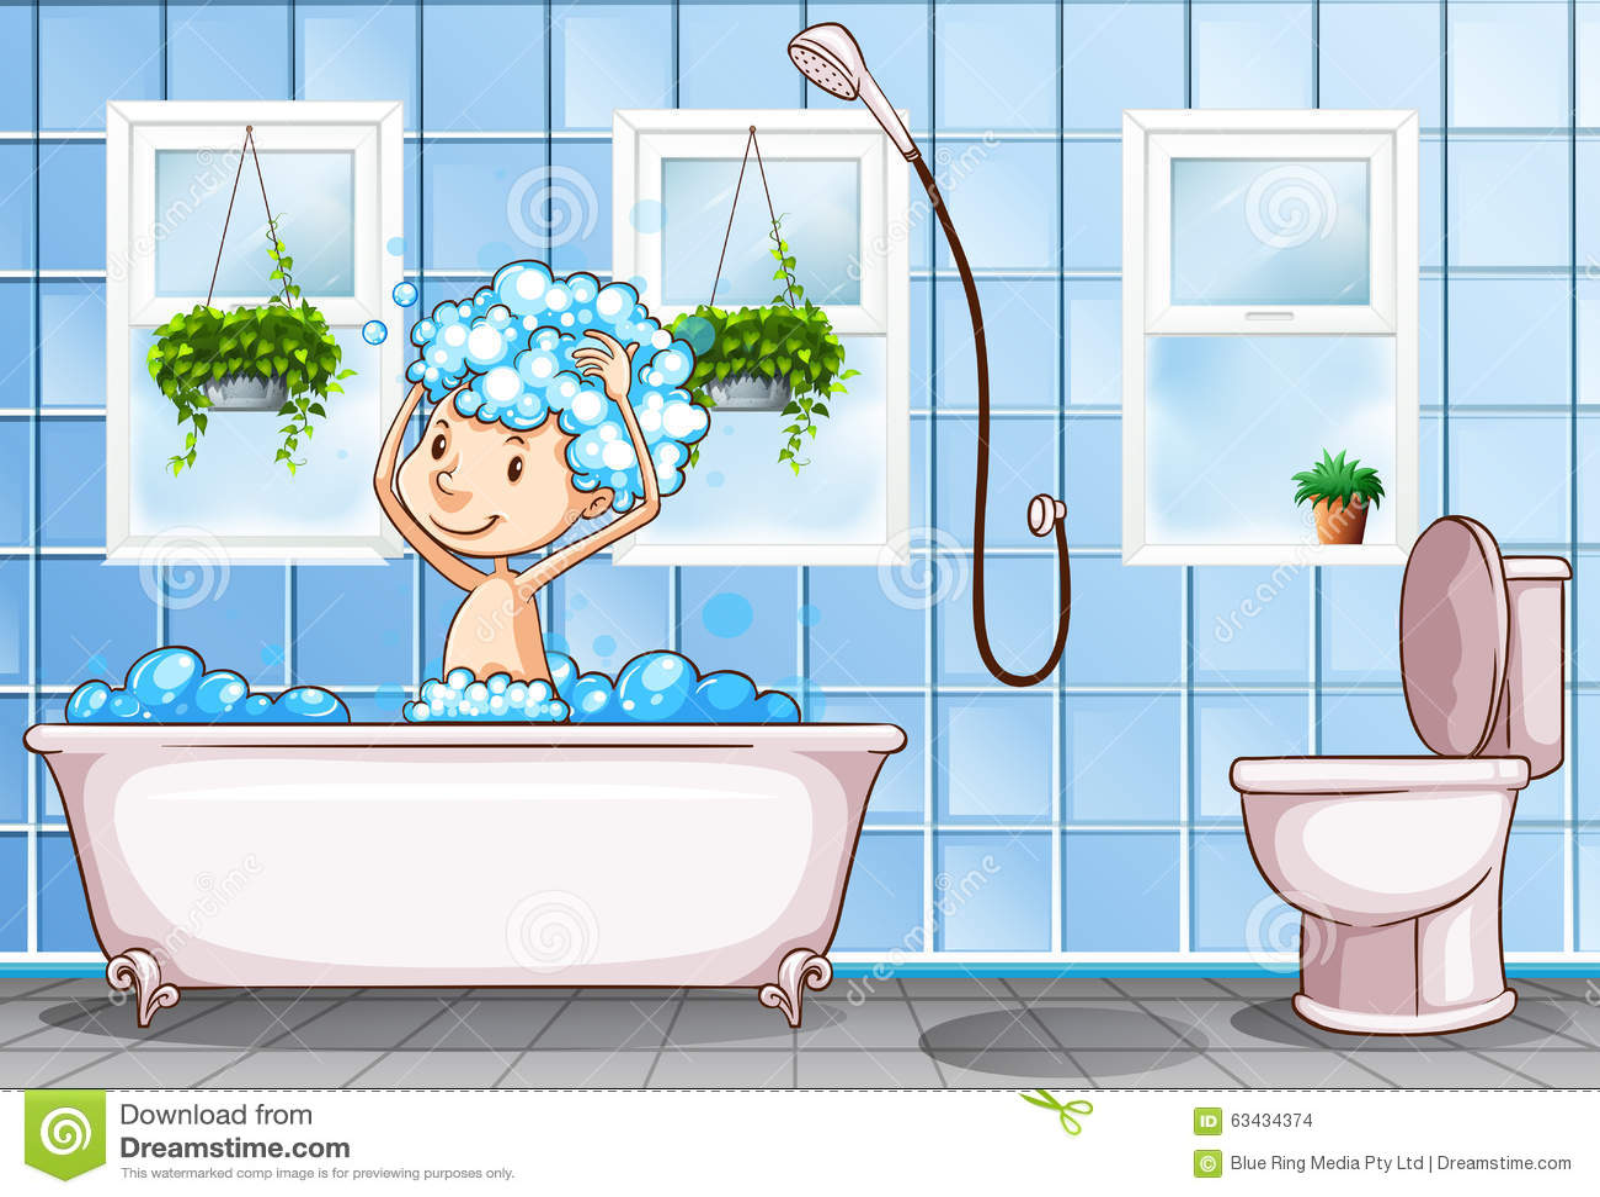 Kid Taking Bath In The Bathroom Stock Vector Image 63434374